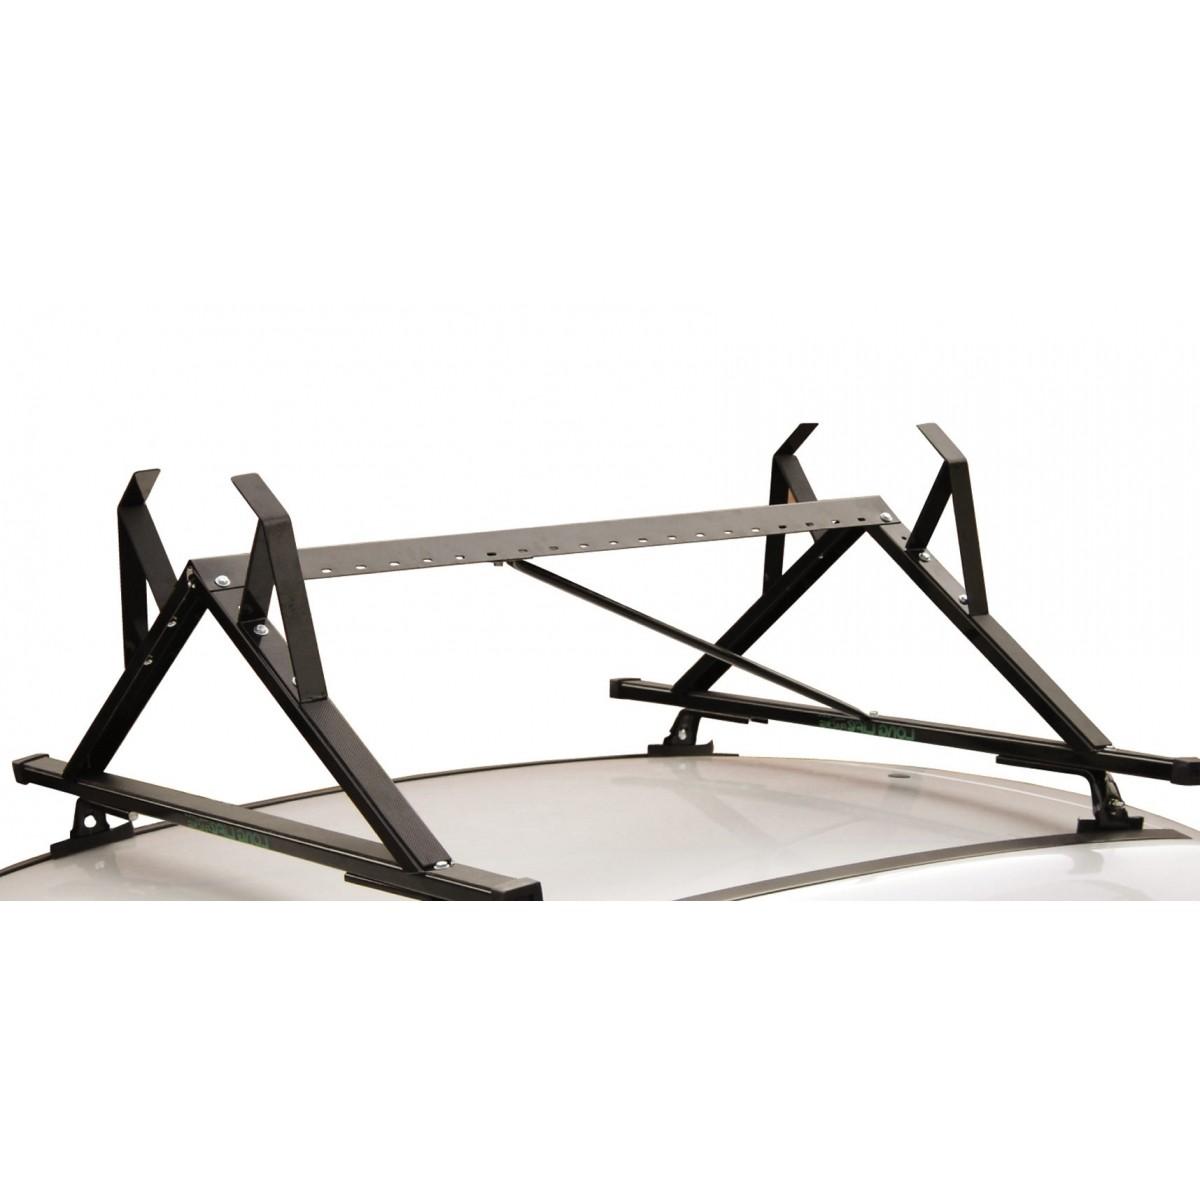 Kit Rack Longlife + Porta Escadas Celta Prisma 4 Portas